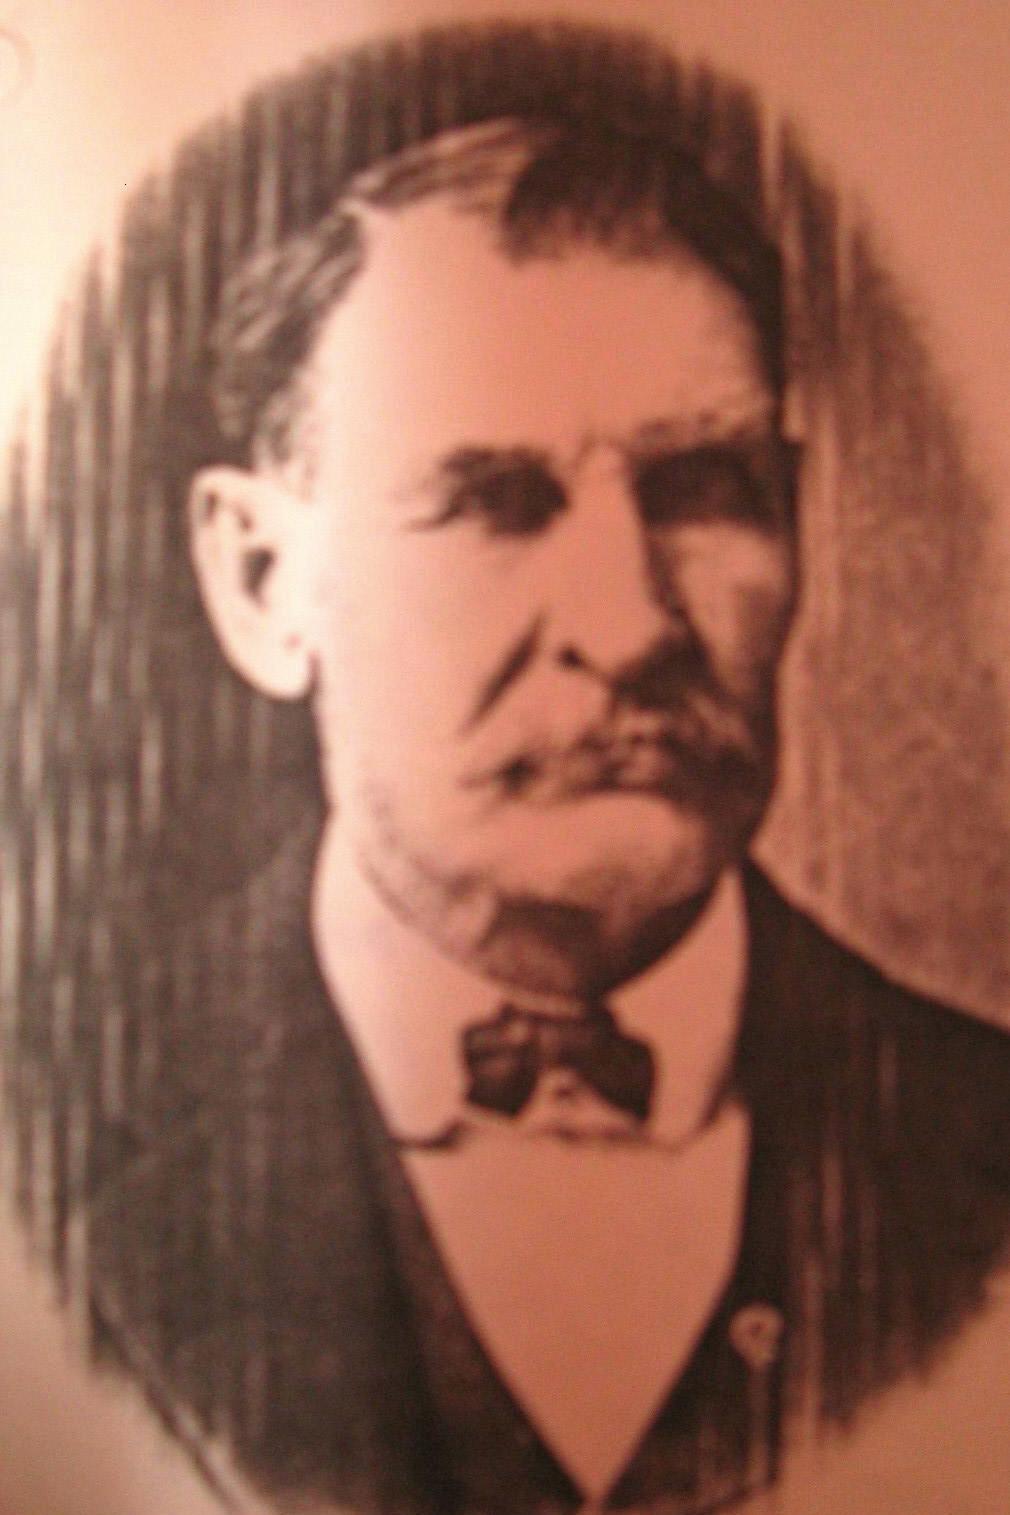 Hiram Turner